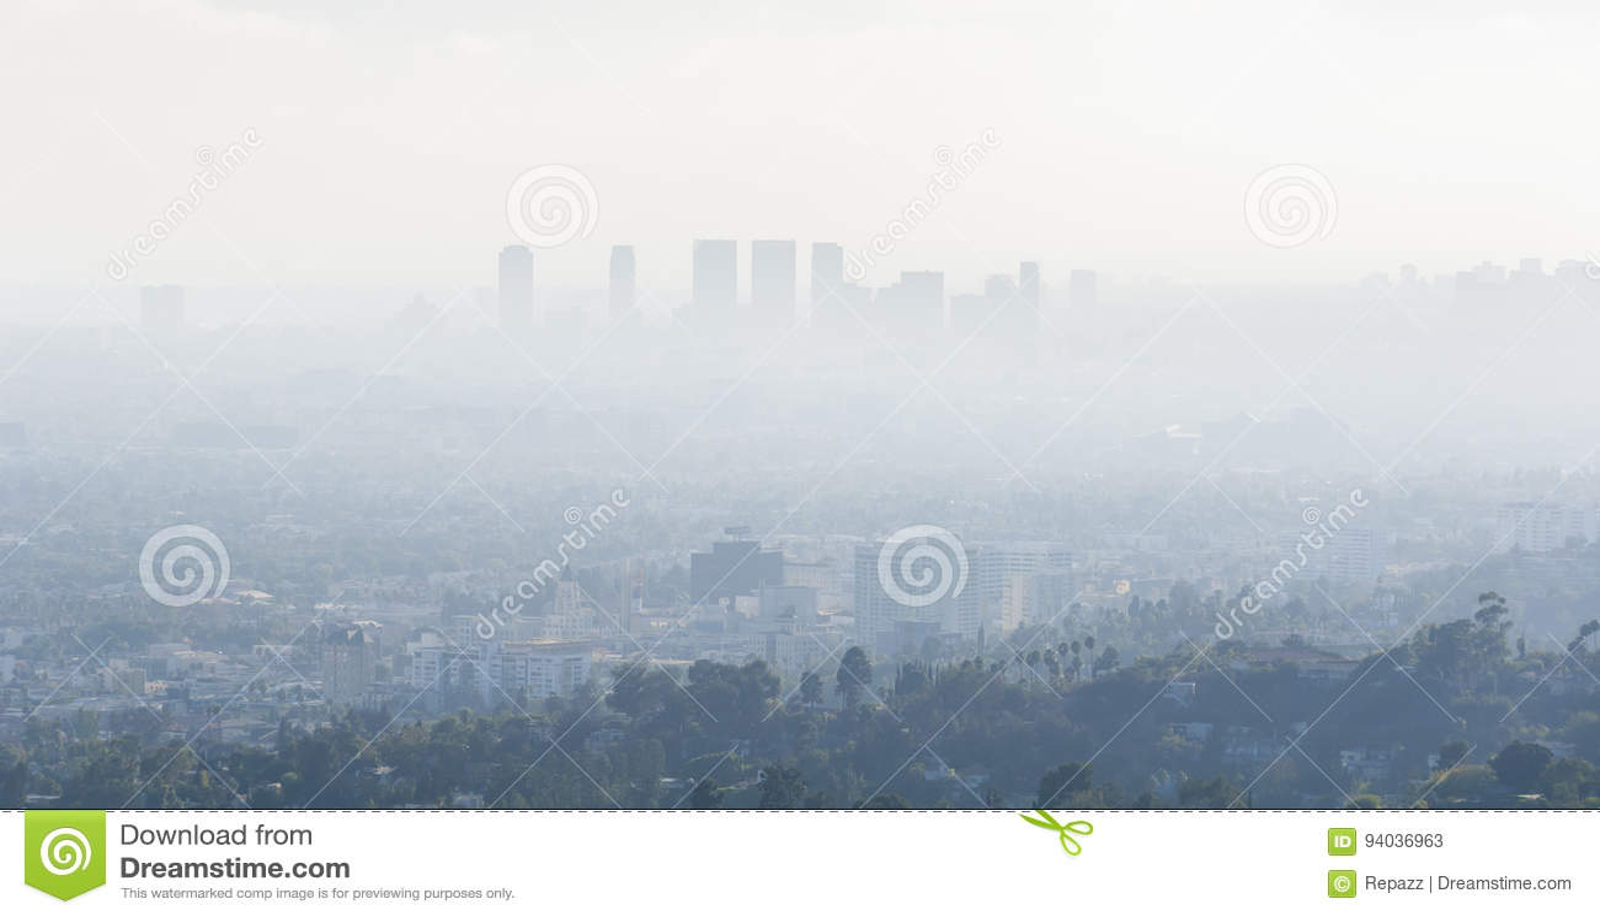 Air Pollution in Los Angeles, California